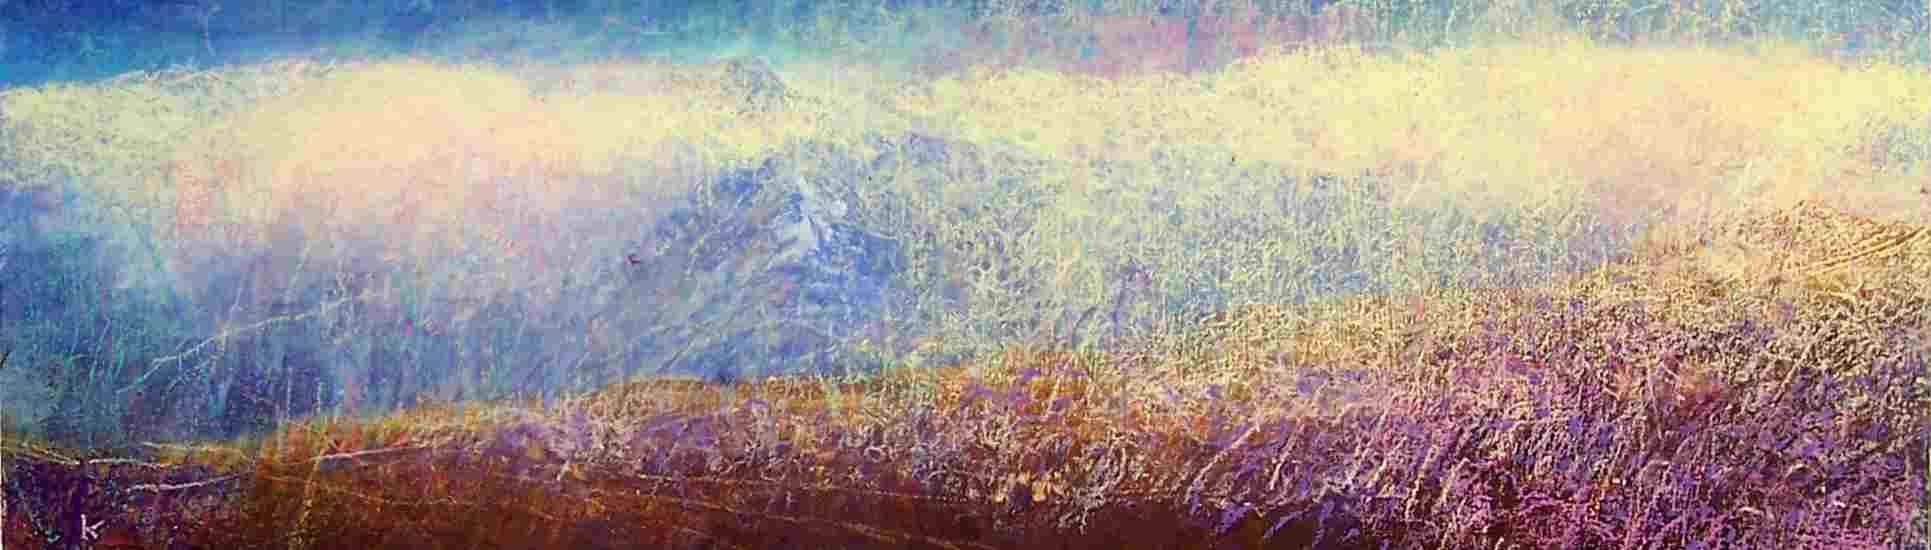 'Blackmount Autumn' , acrylic pastel 2007, 75 x23 cm Ref: 53